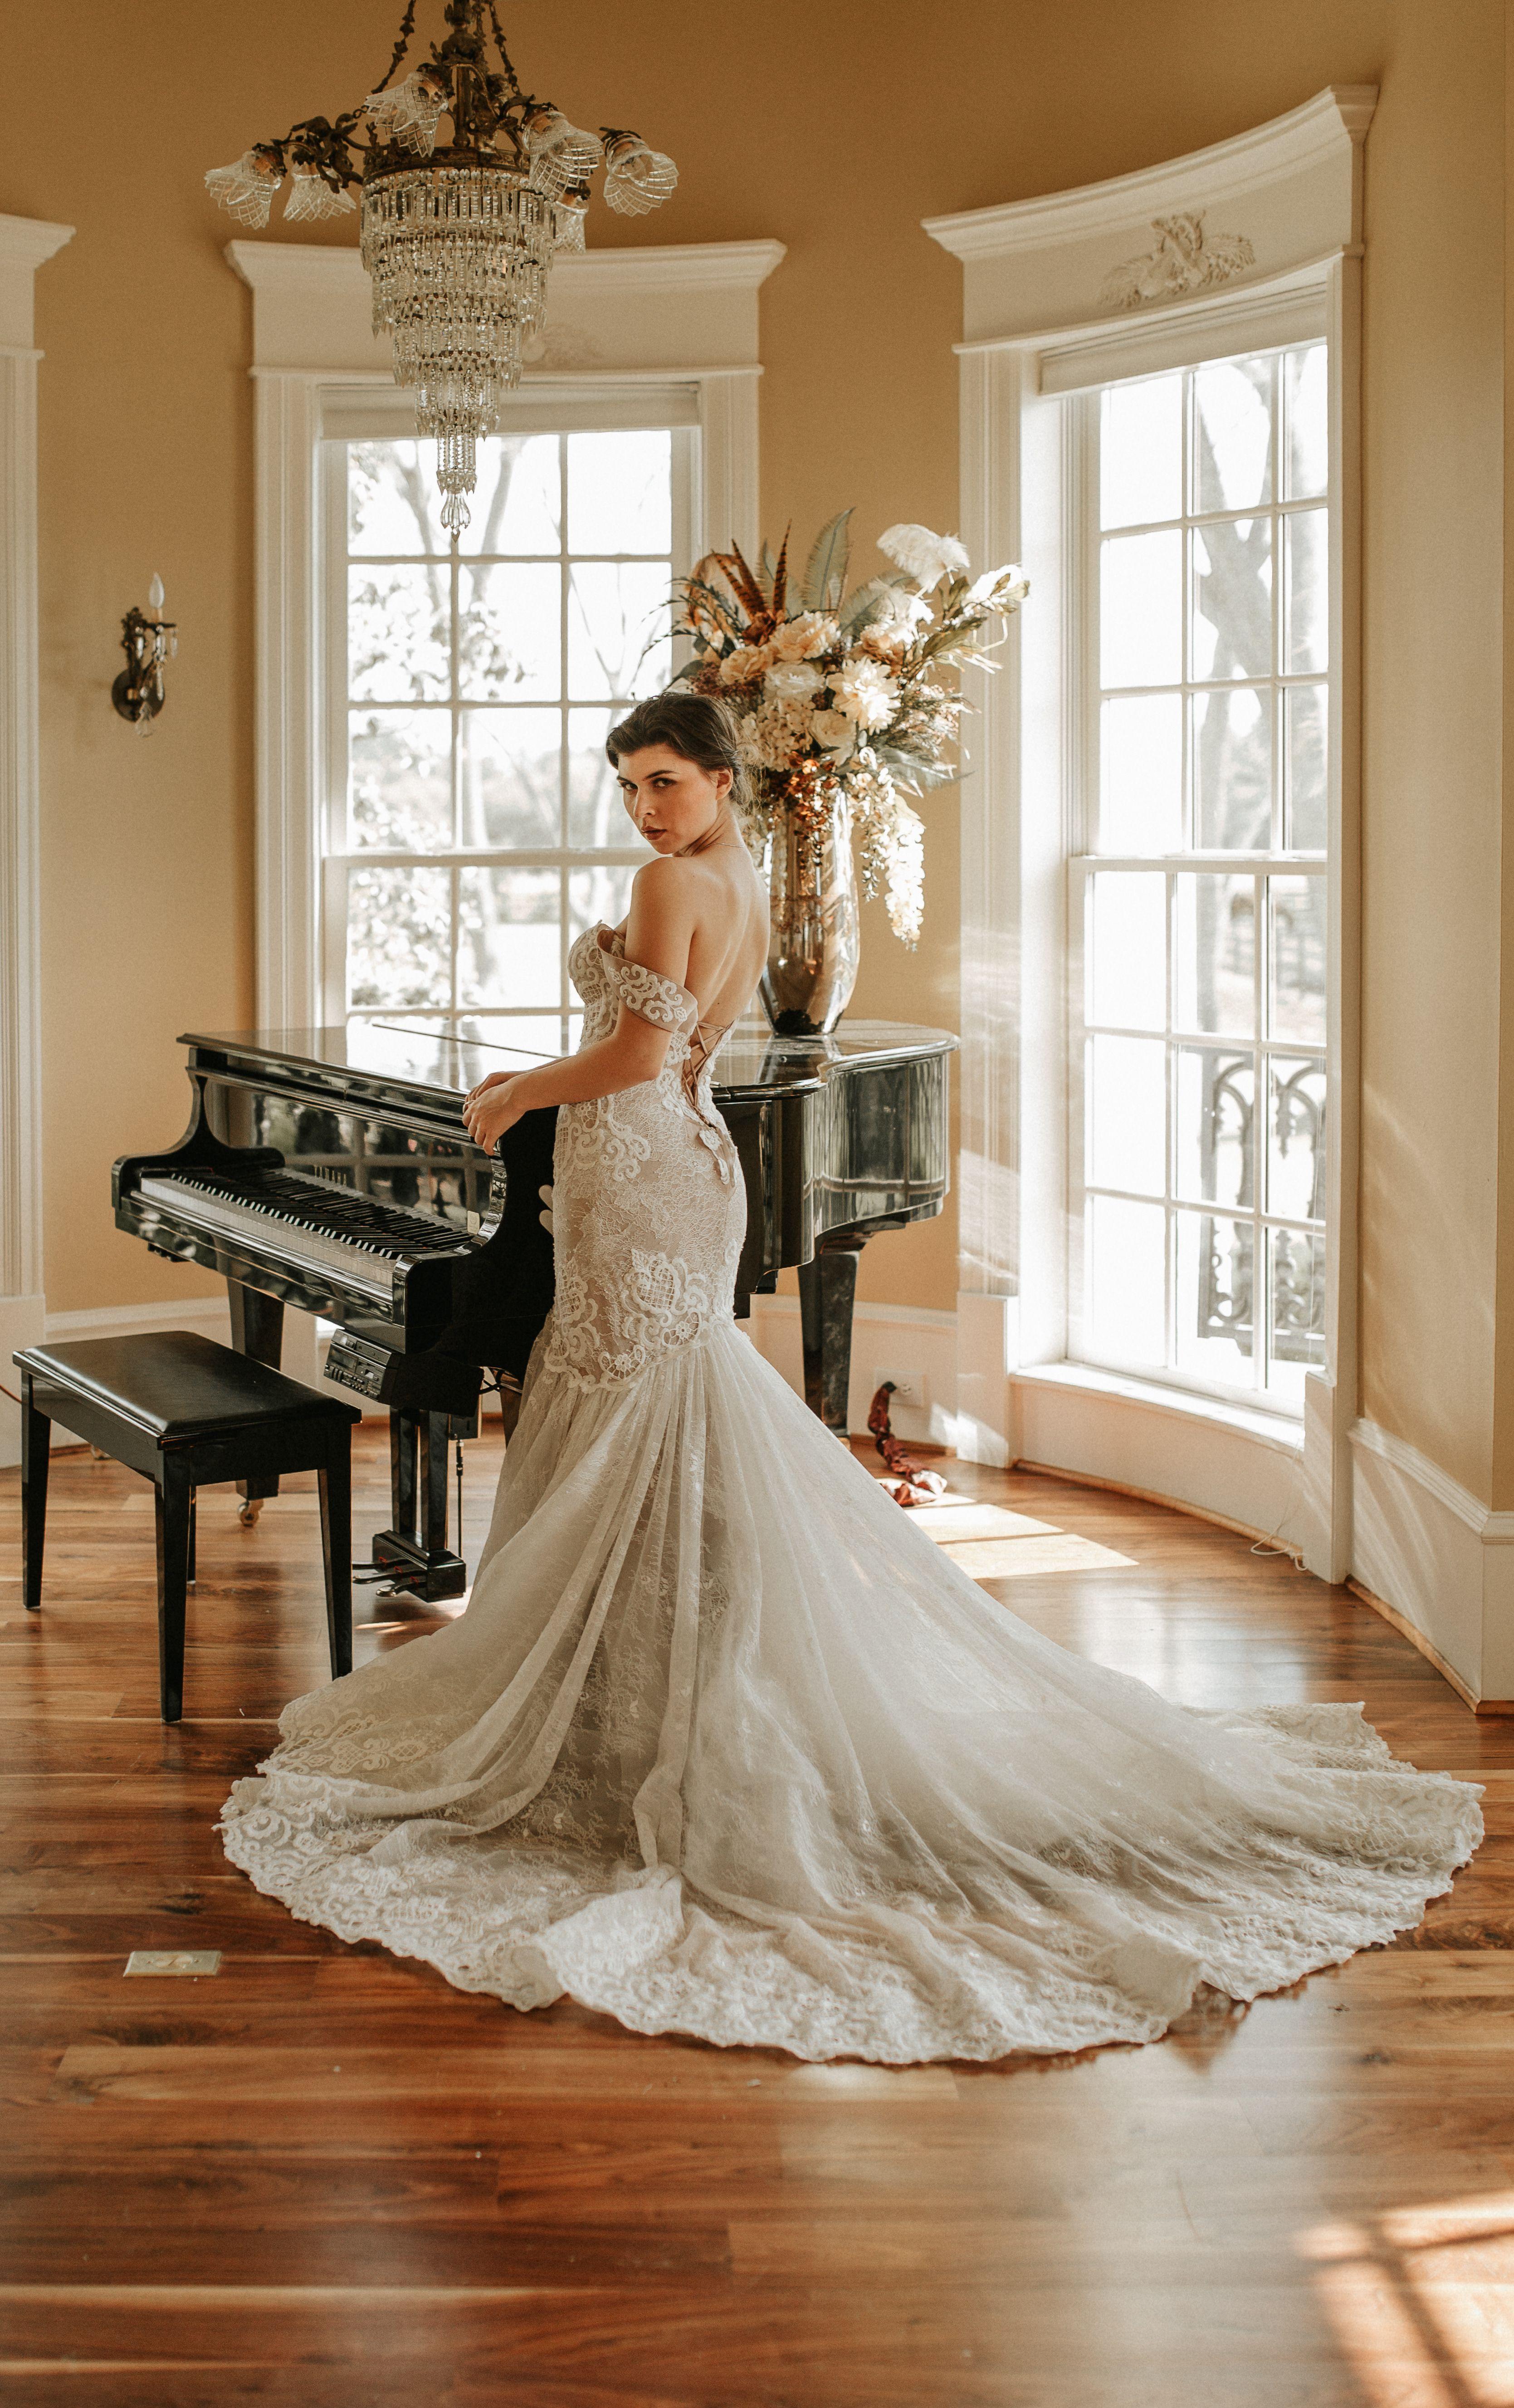 Miss South Texas In Rara Avis Dress At Milenasbridal Com Wedding Dresses Houston Simple Wedding Favors Wedding